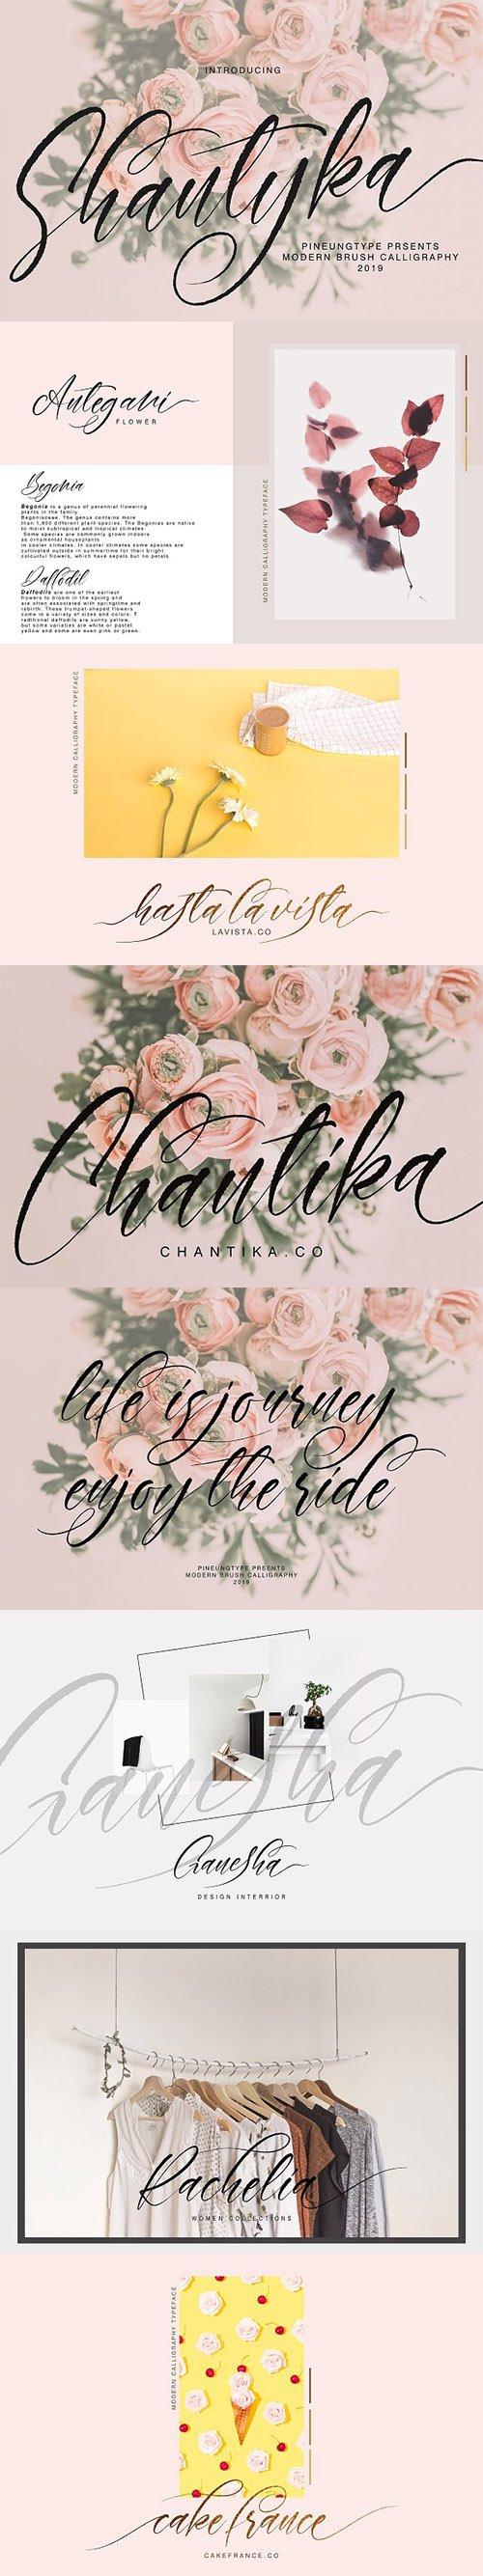 Shantyka Font 3359456